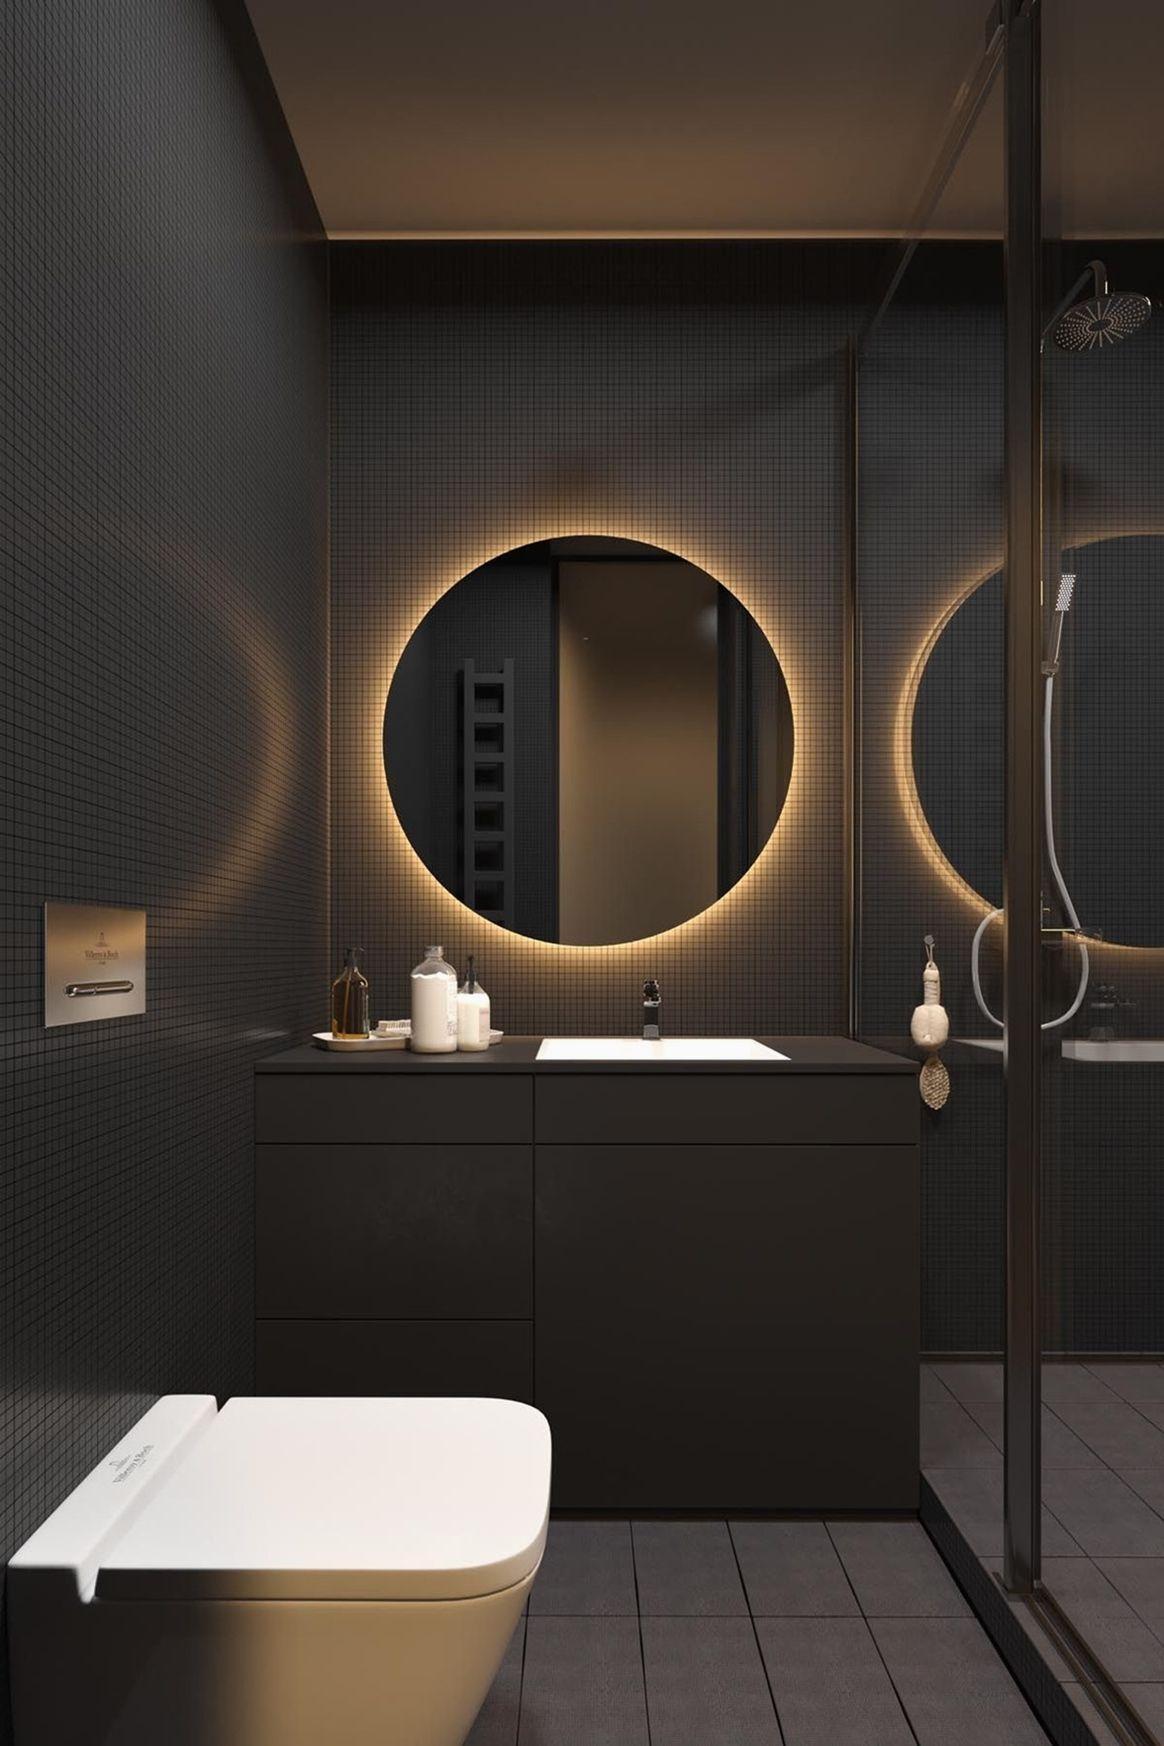 Remodeling Bathroom Design Software Free Gray And White Bathroom Modern Bathroom Design Bathroom Interior Design